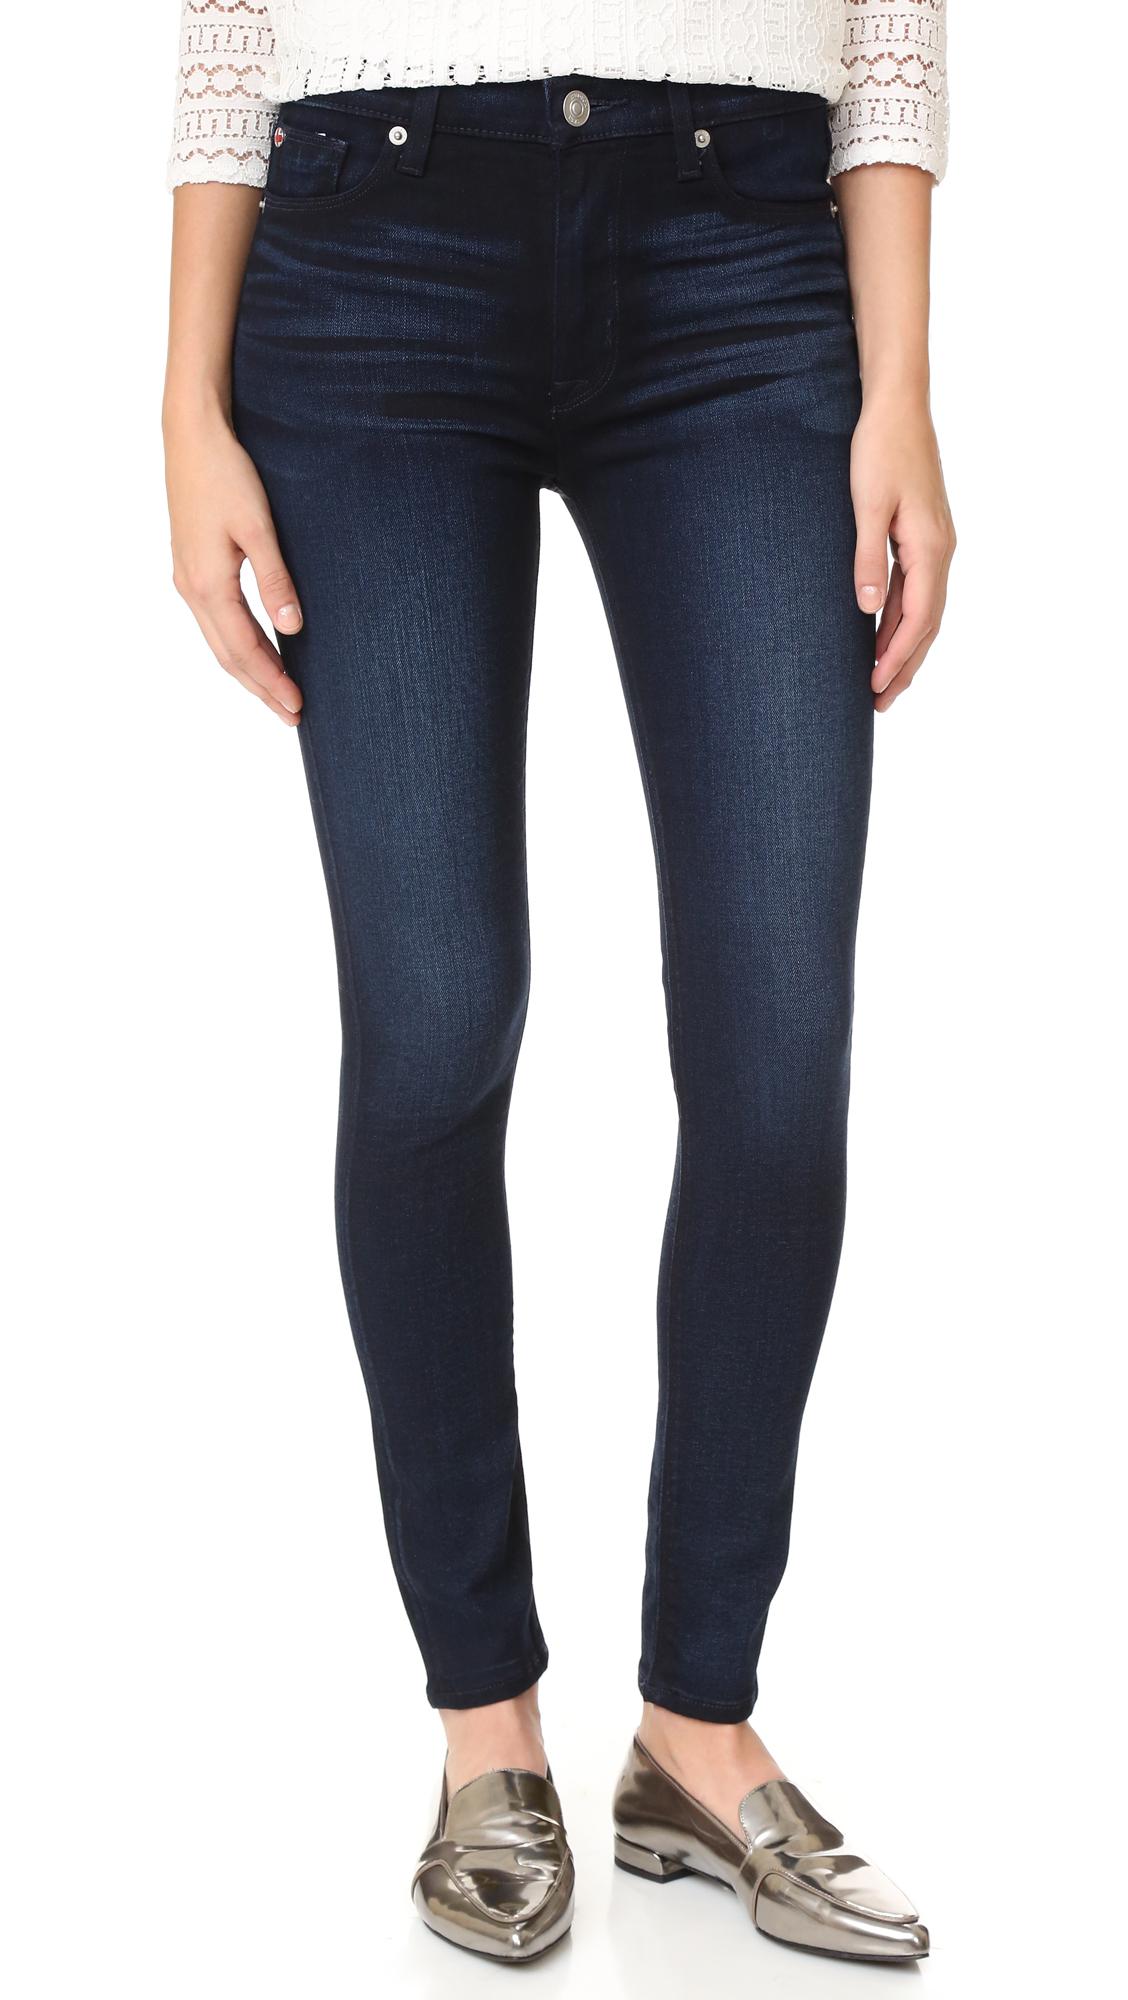 Hudson Barbara High Waisted Super Skinny Jeans - Night Vision at Shopbop